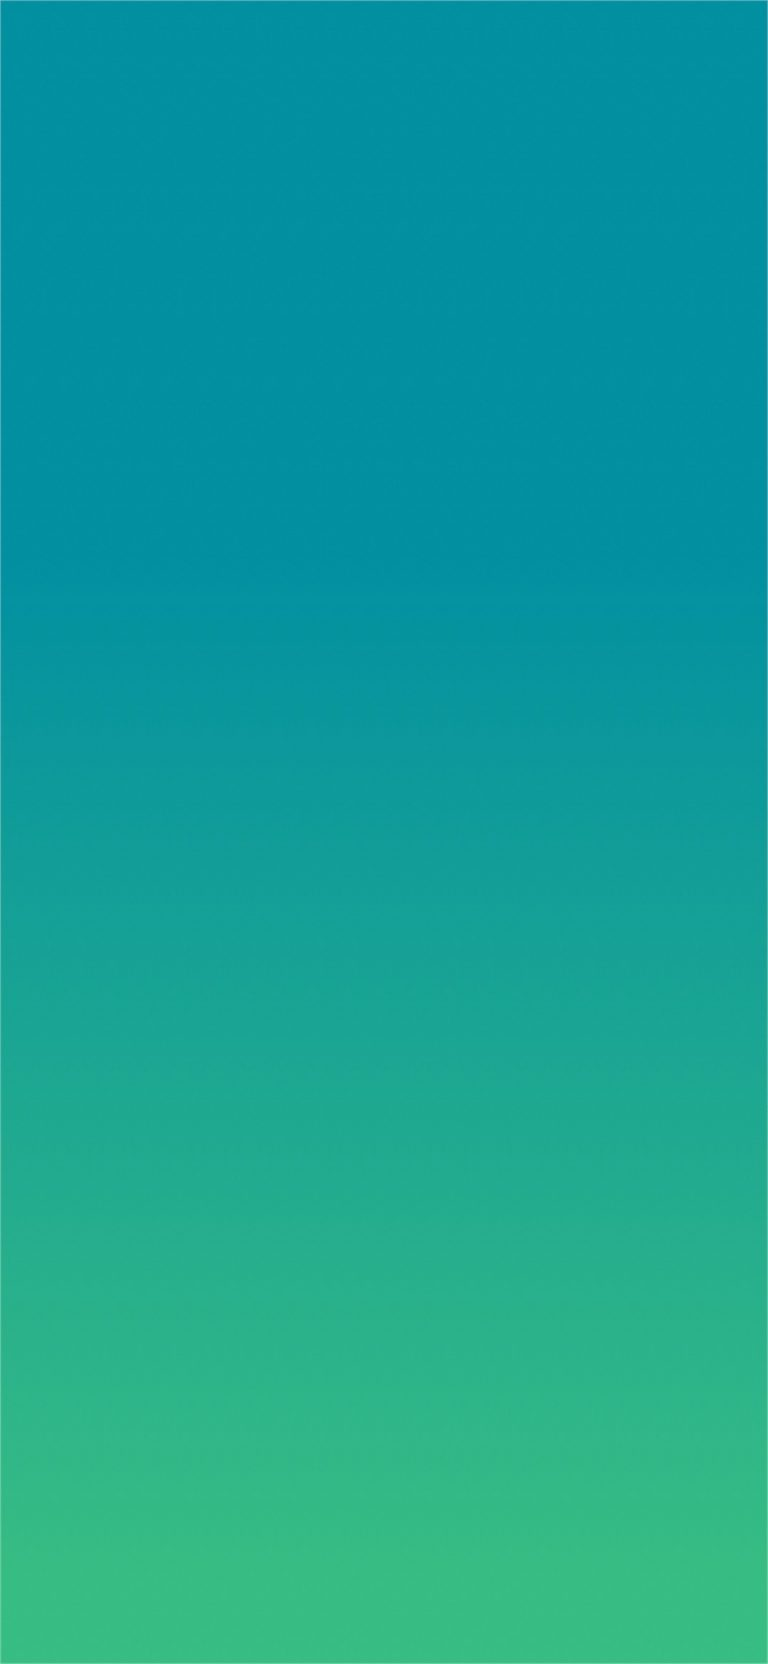 Color OS 6 Stock Wallpaper 05 1080x2340 768x1664